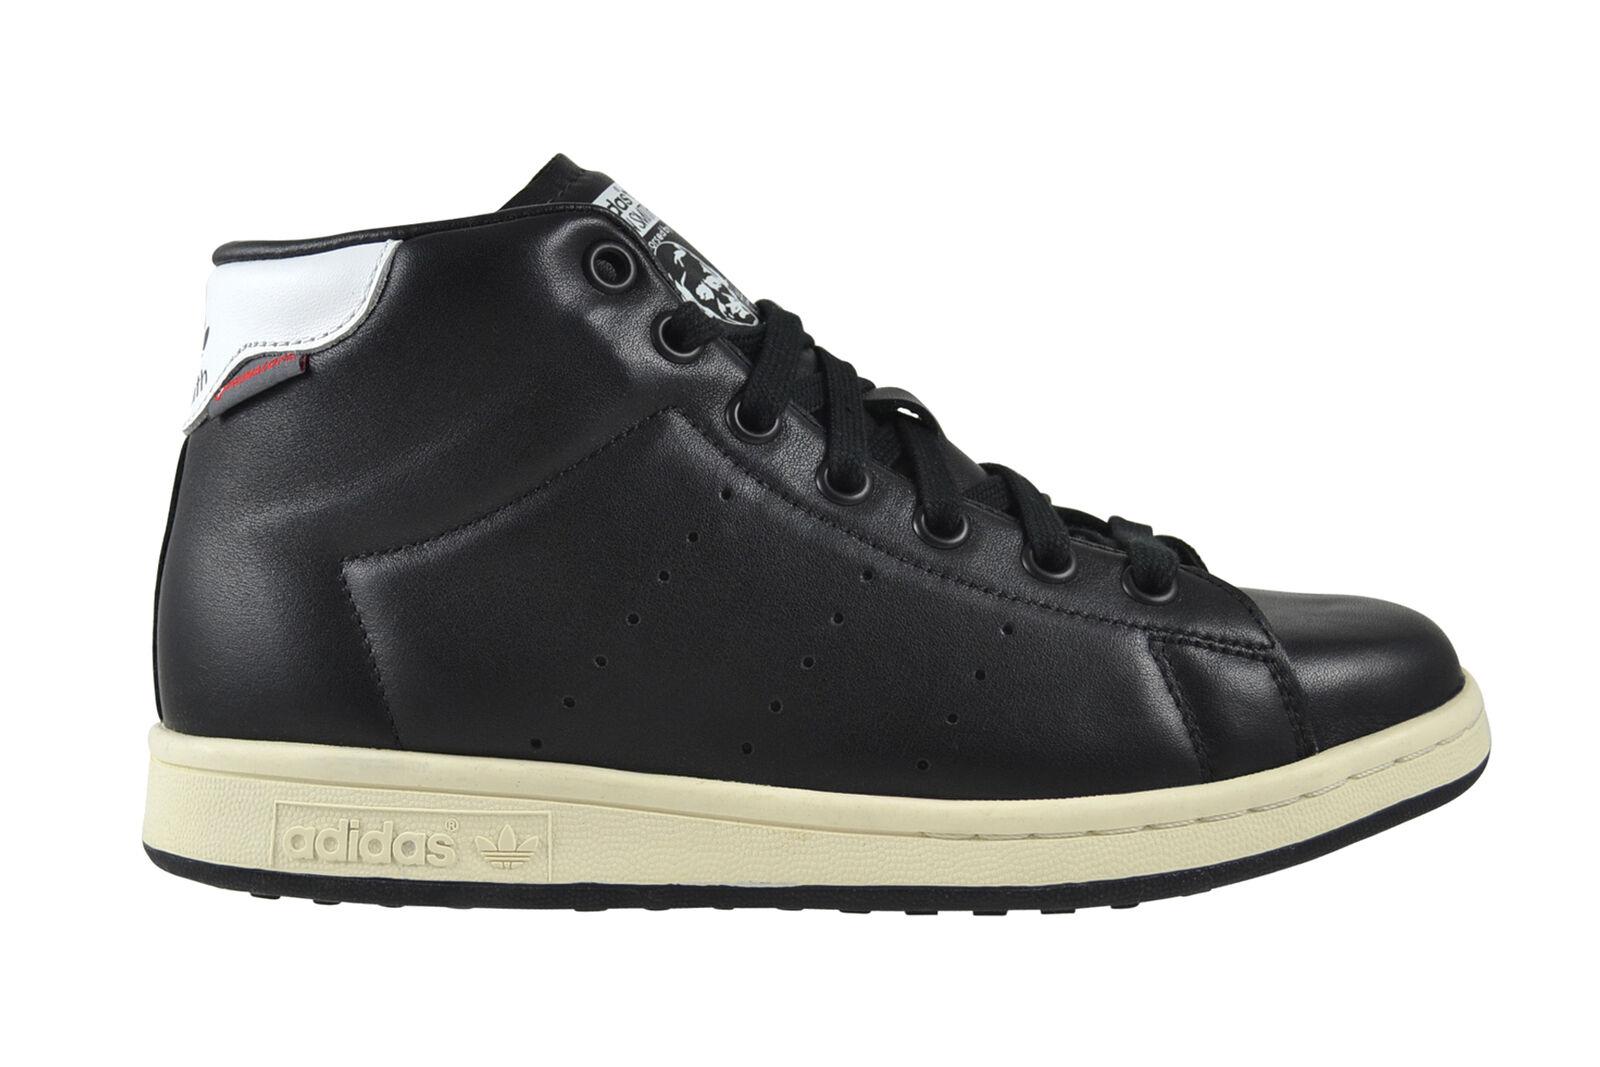 Adidas Stan Smith invierno Core negro blanco negro zapatos s80497